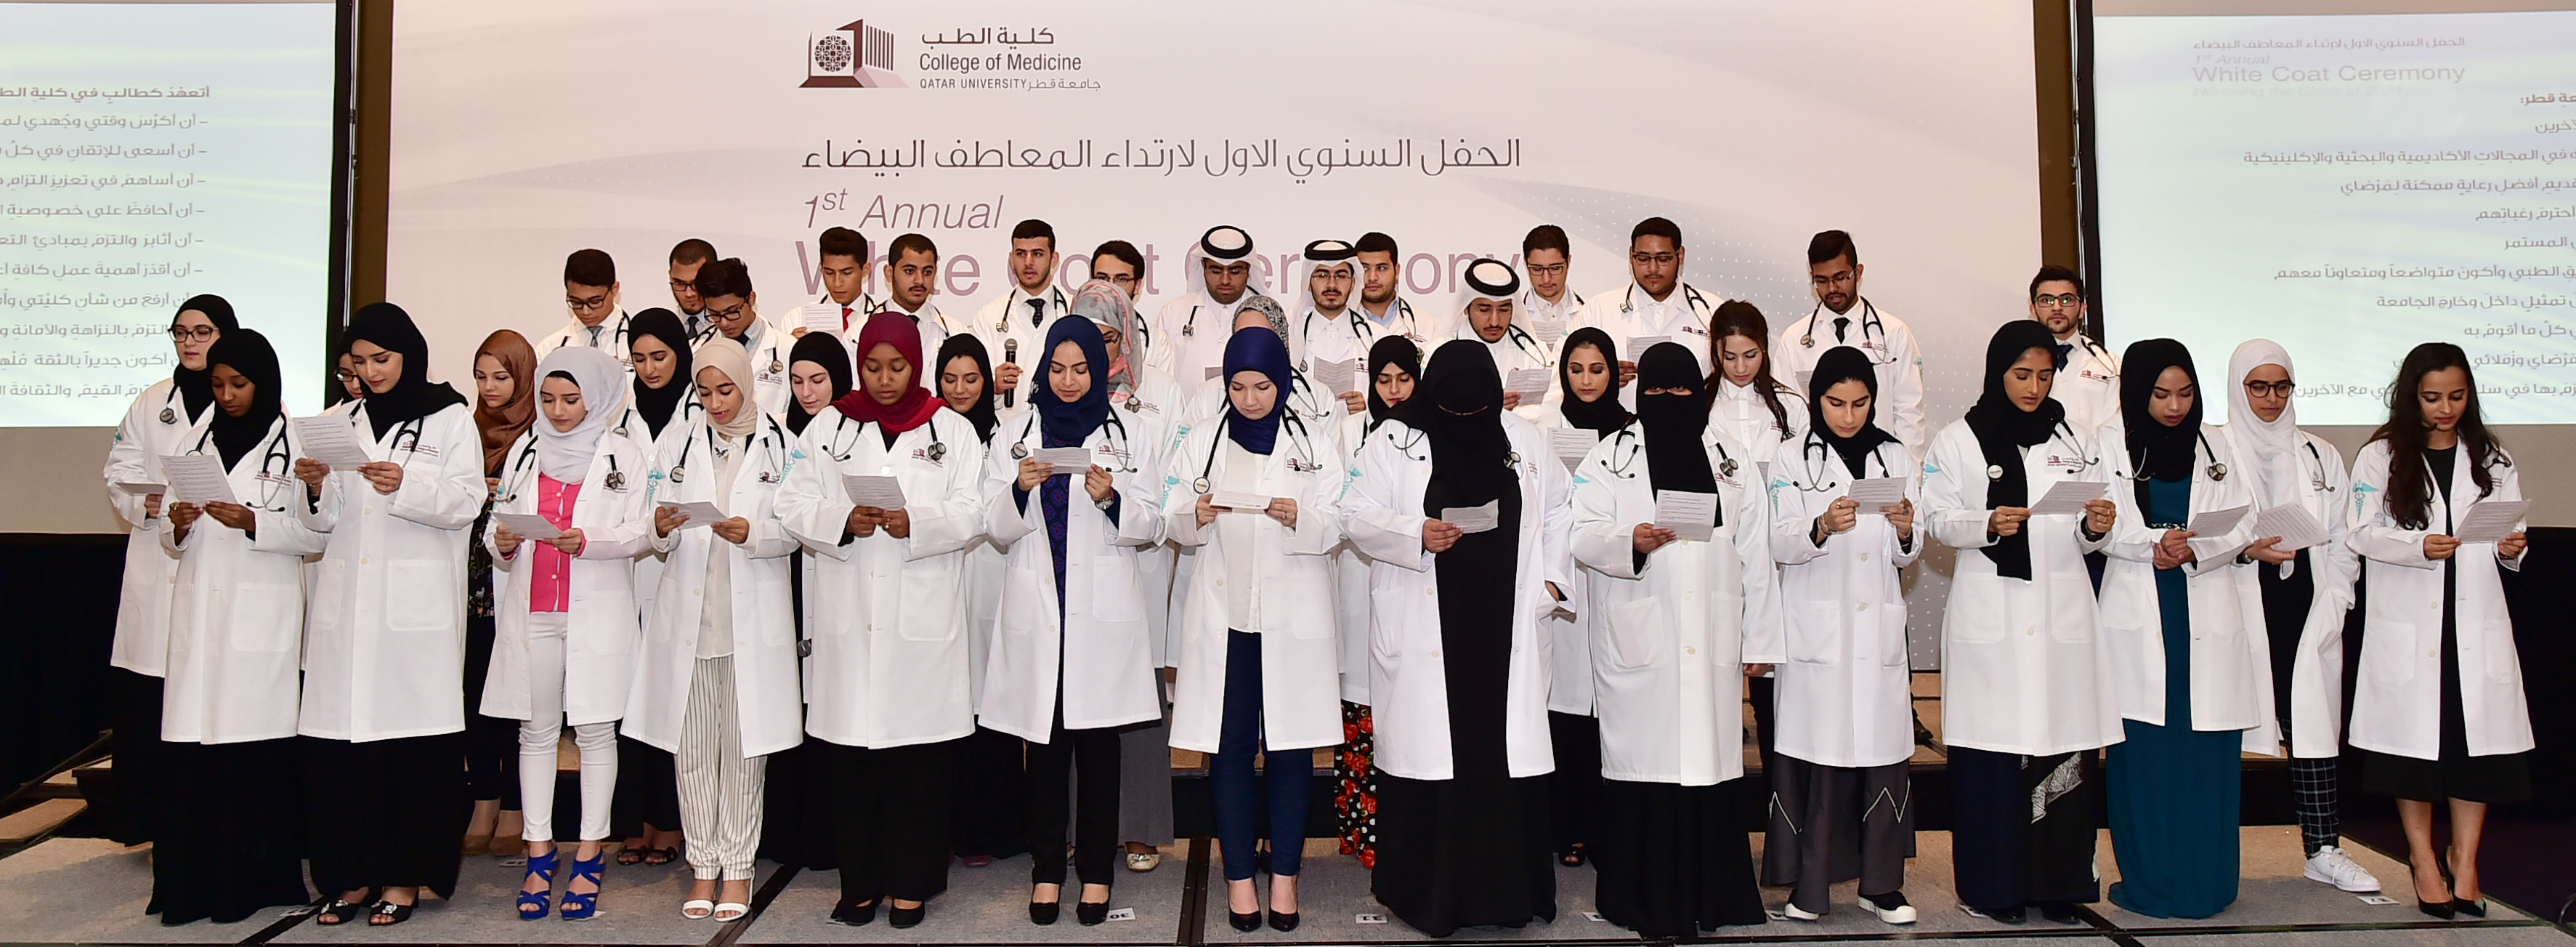 College of Medicine | Qatar University